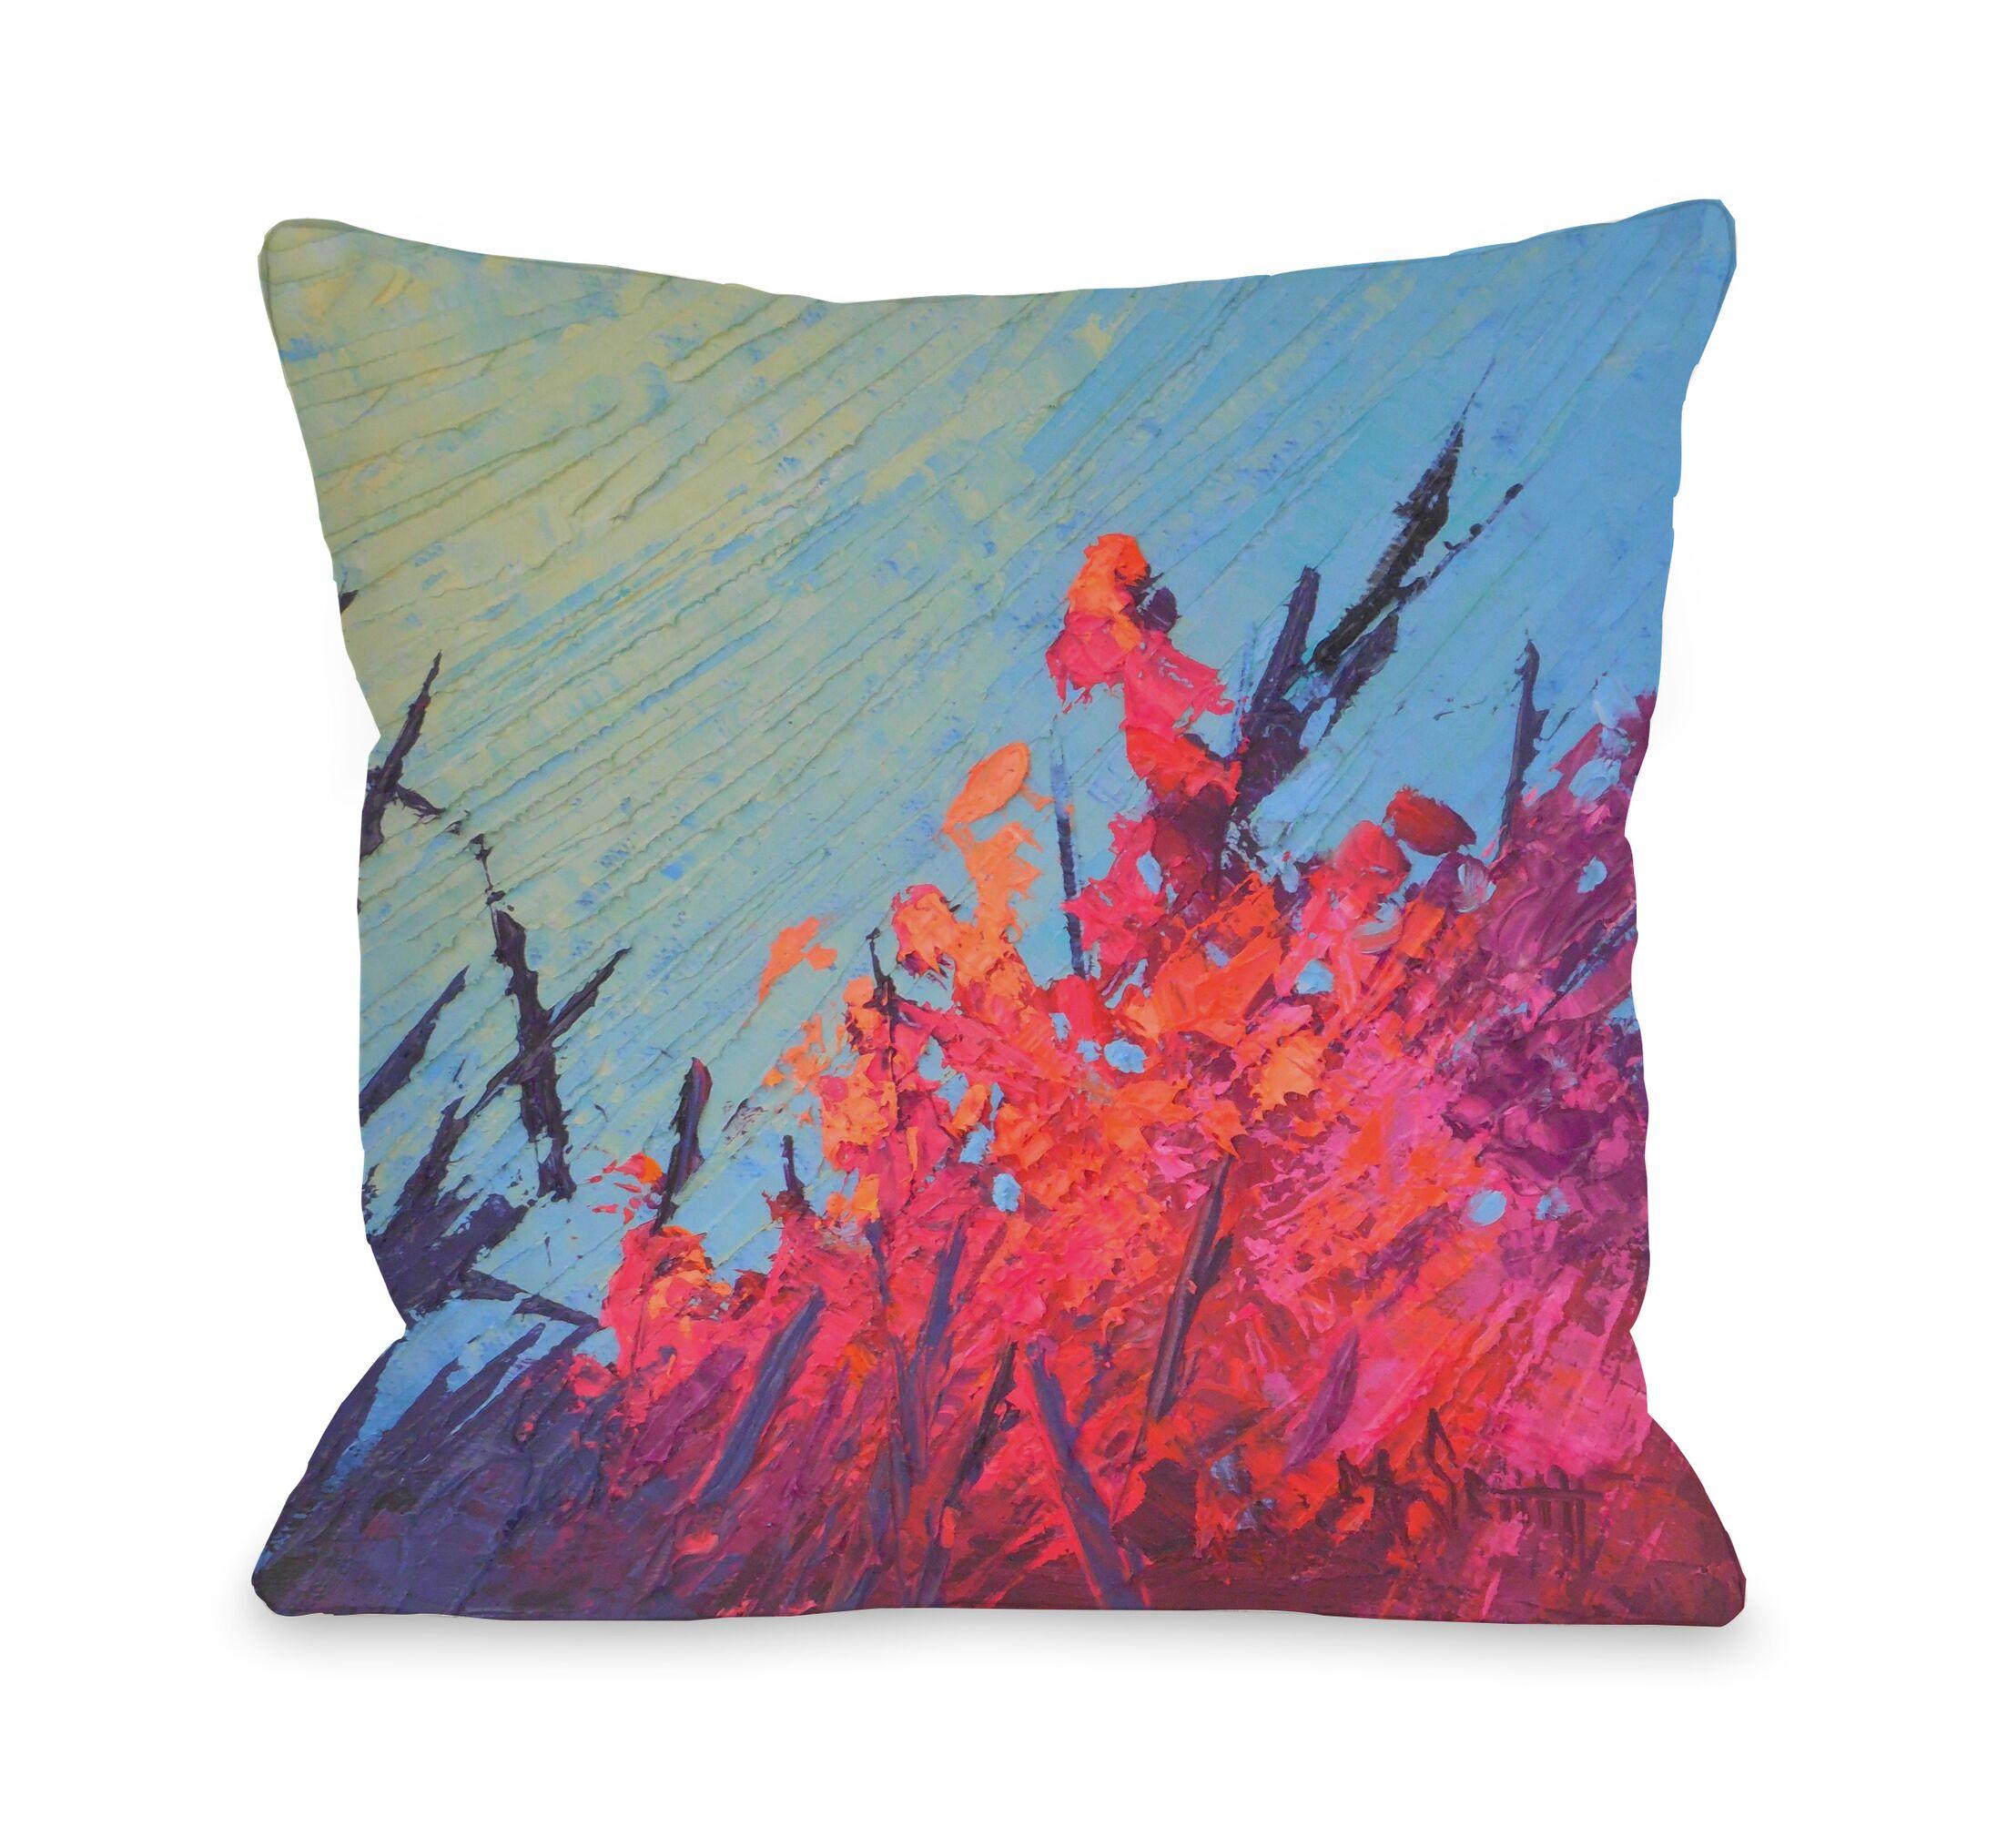 Billips Reef Garden Outdoor Throw Pillow Size: 18